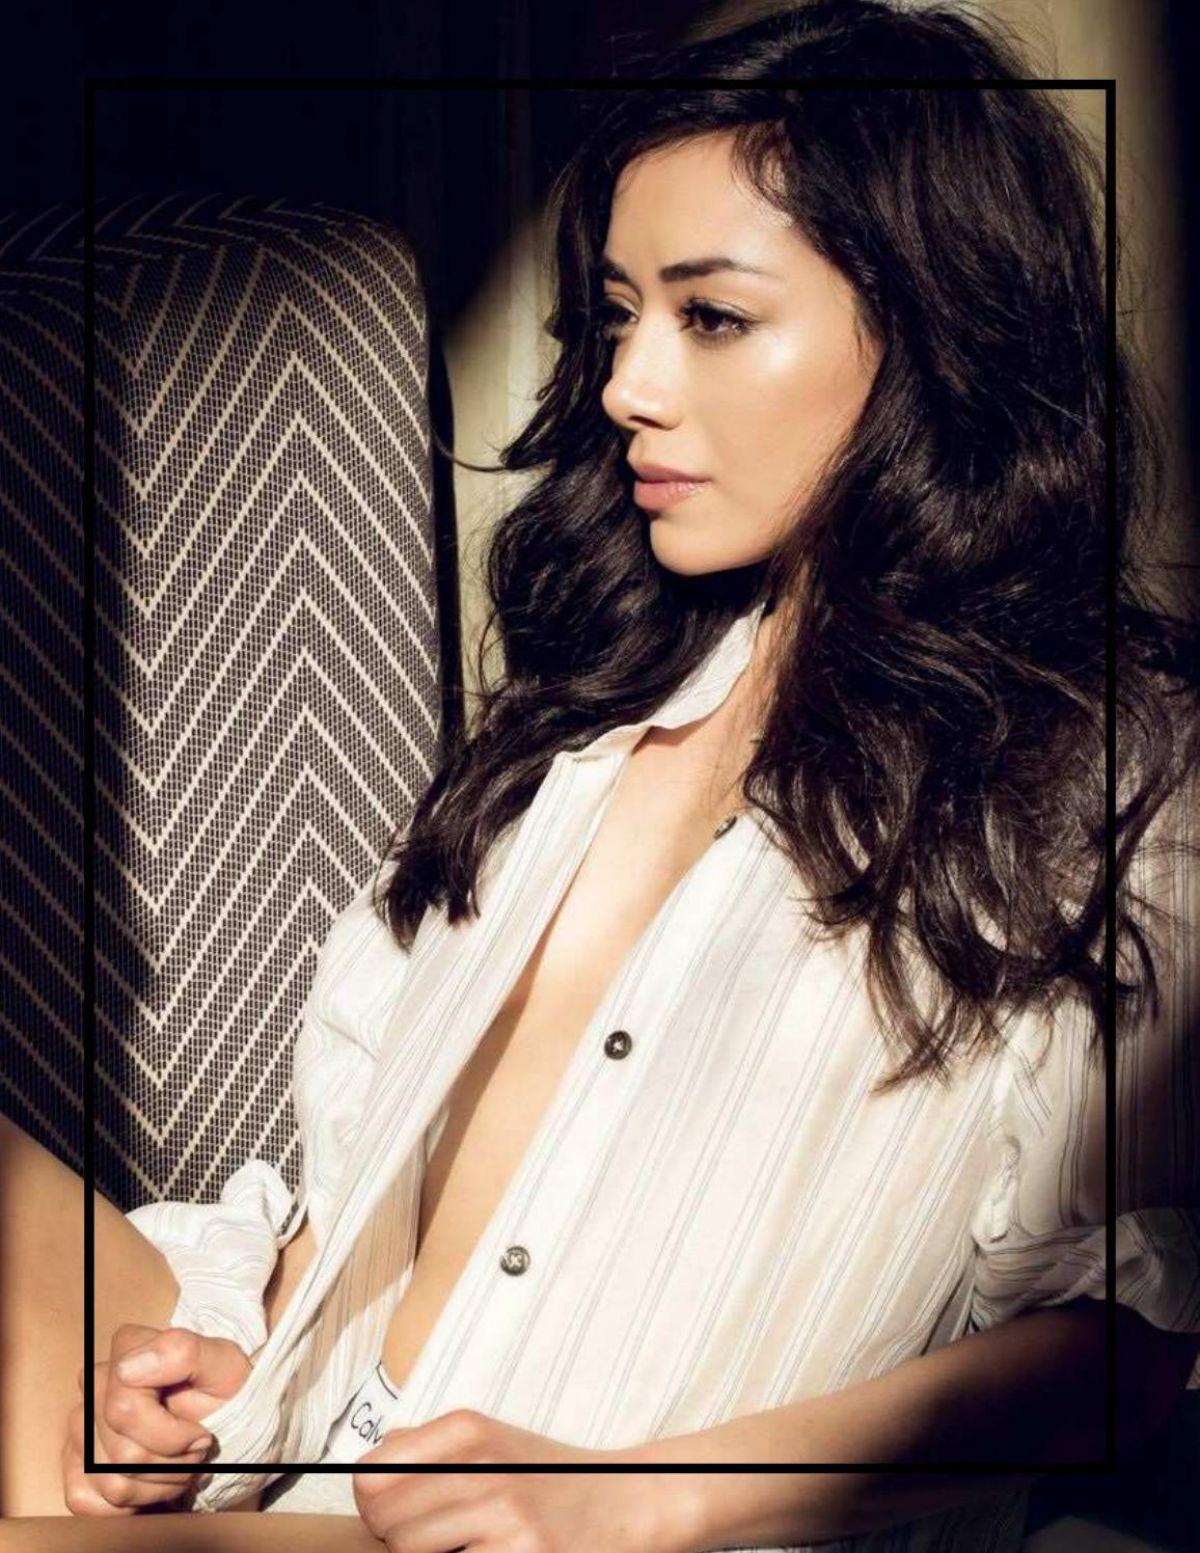 Fotos Aimee Garcia naked (51 pics), Leaked